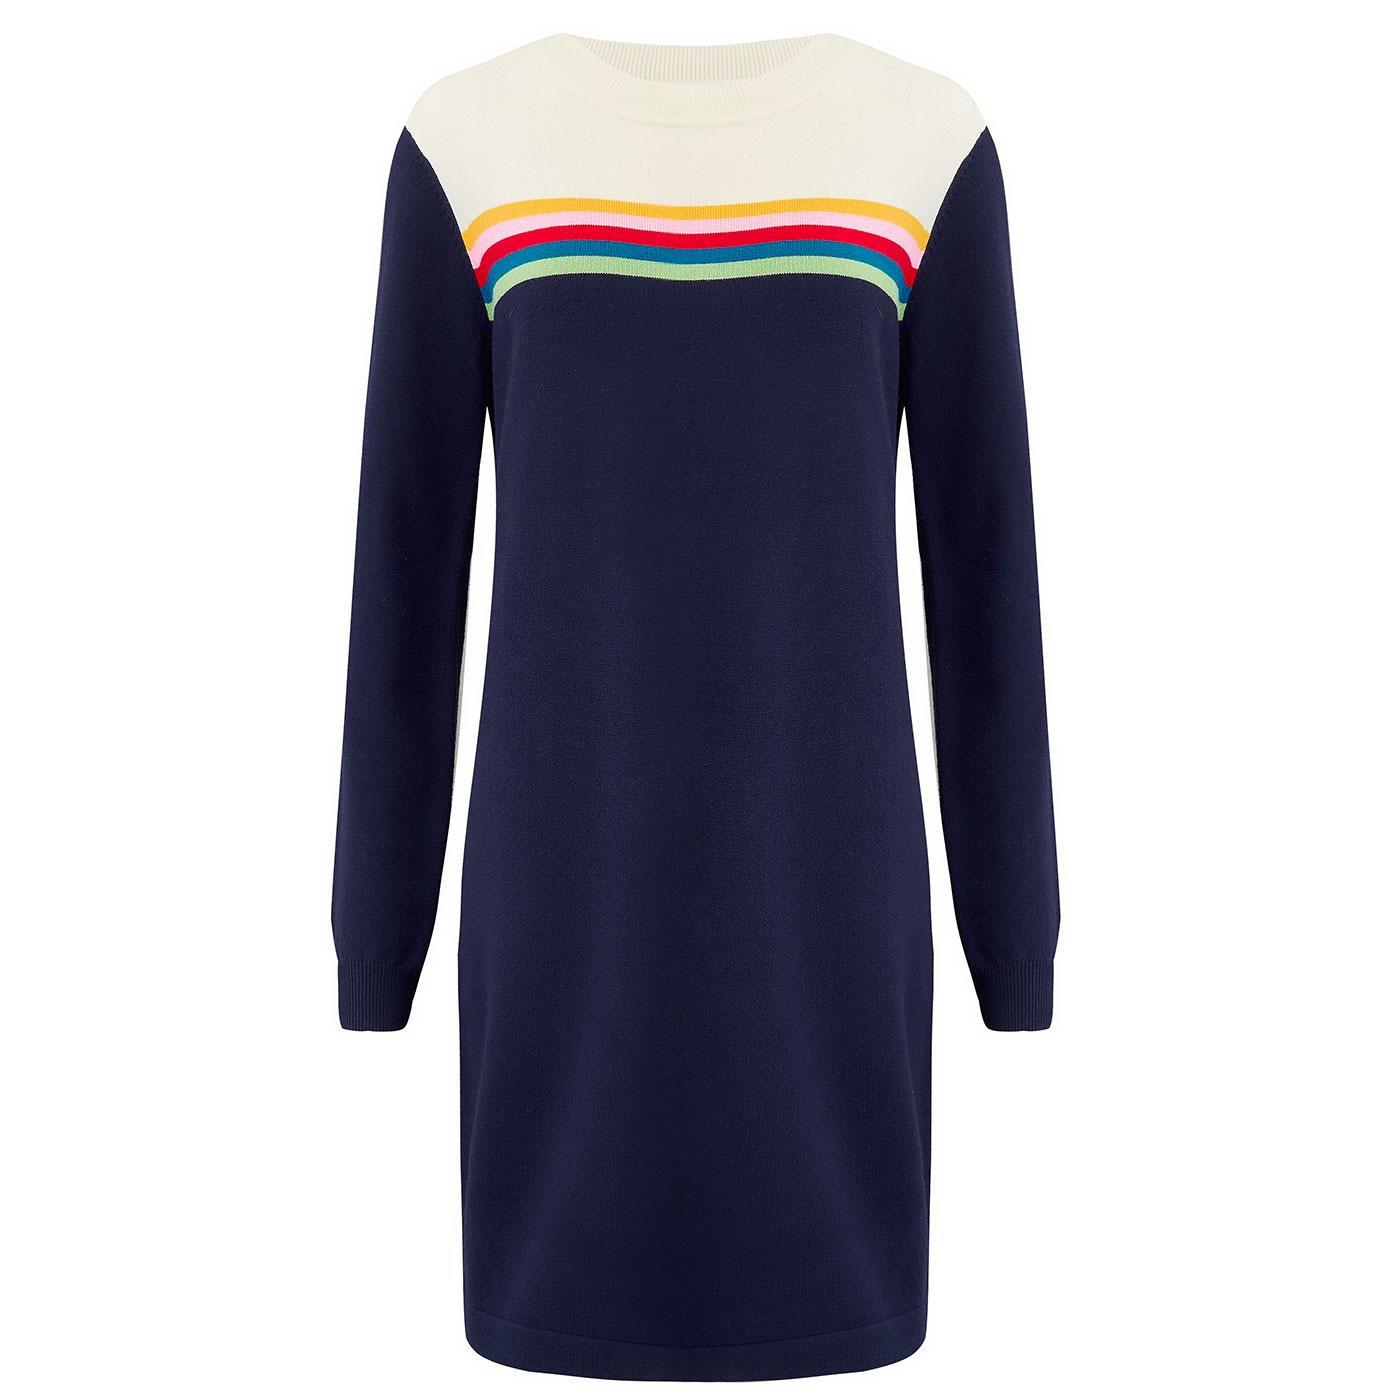 Orla SUGARHILL Retro Rainbow Stripe Knitted Dress